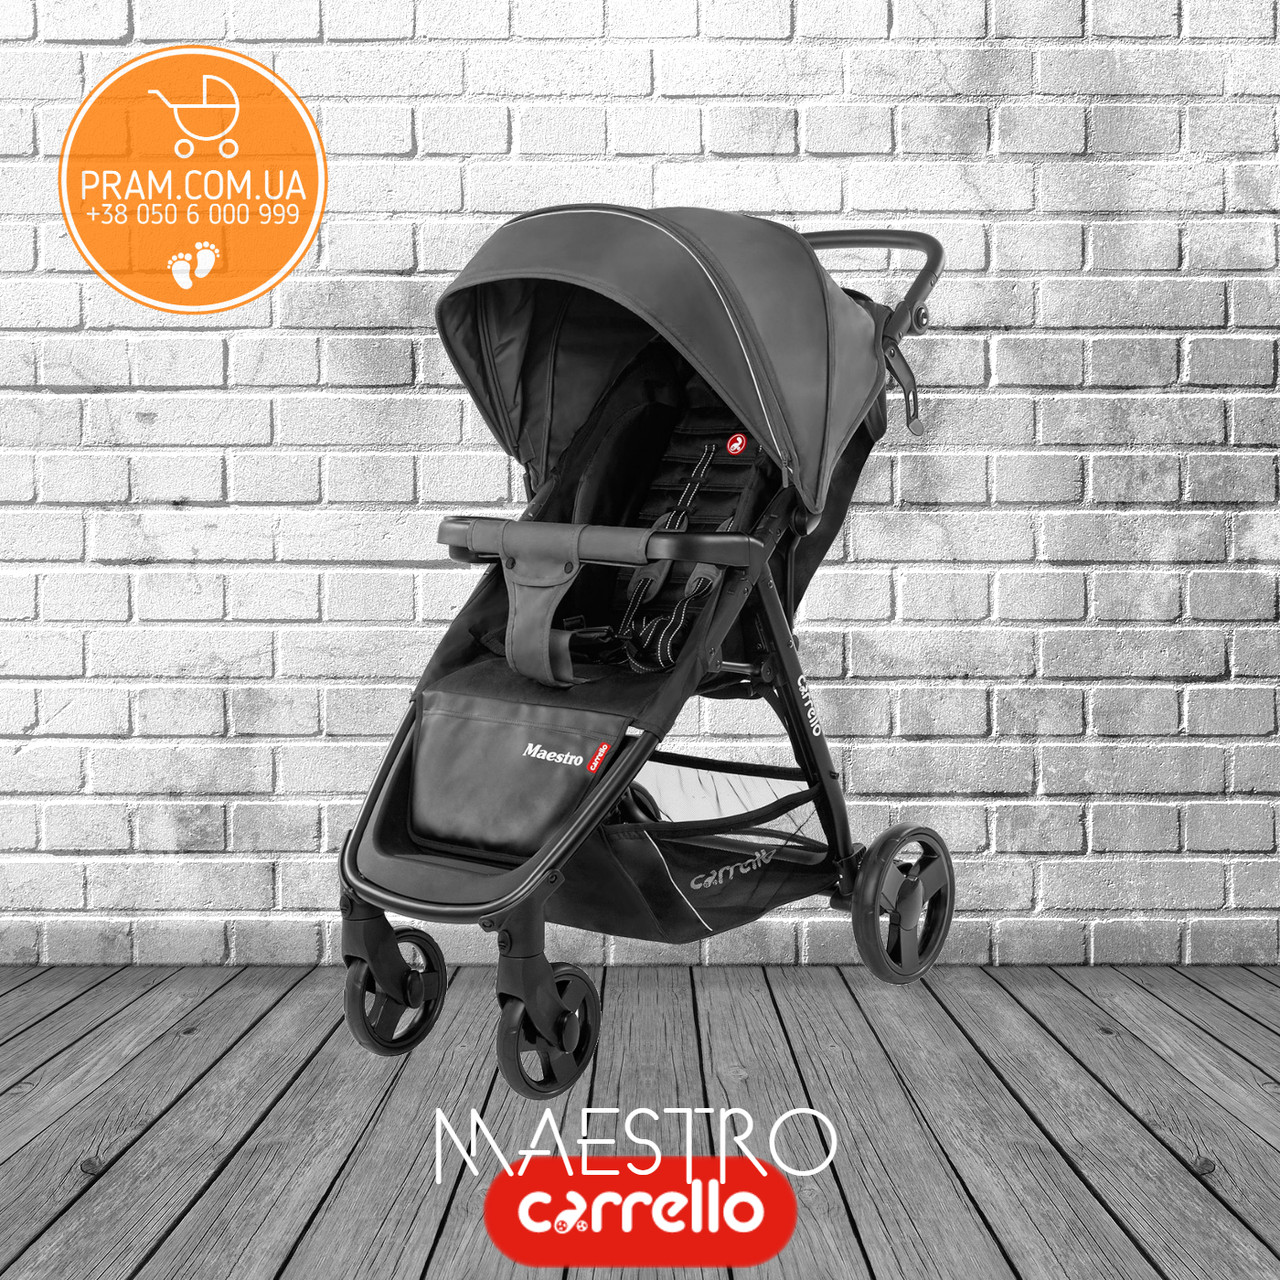 CARRELLO MAESTRO CRL-1414 прогулочная коляска Pearl Grey Темно-серый